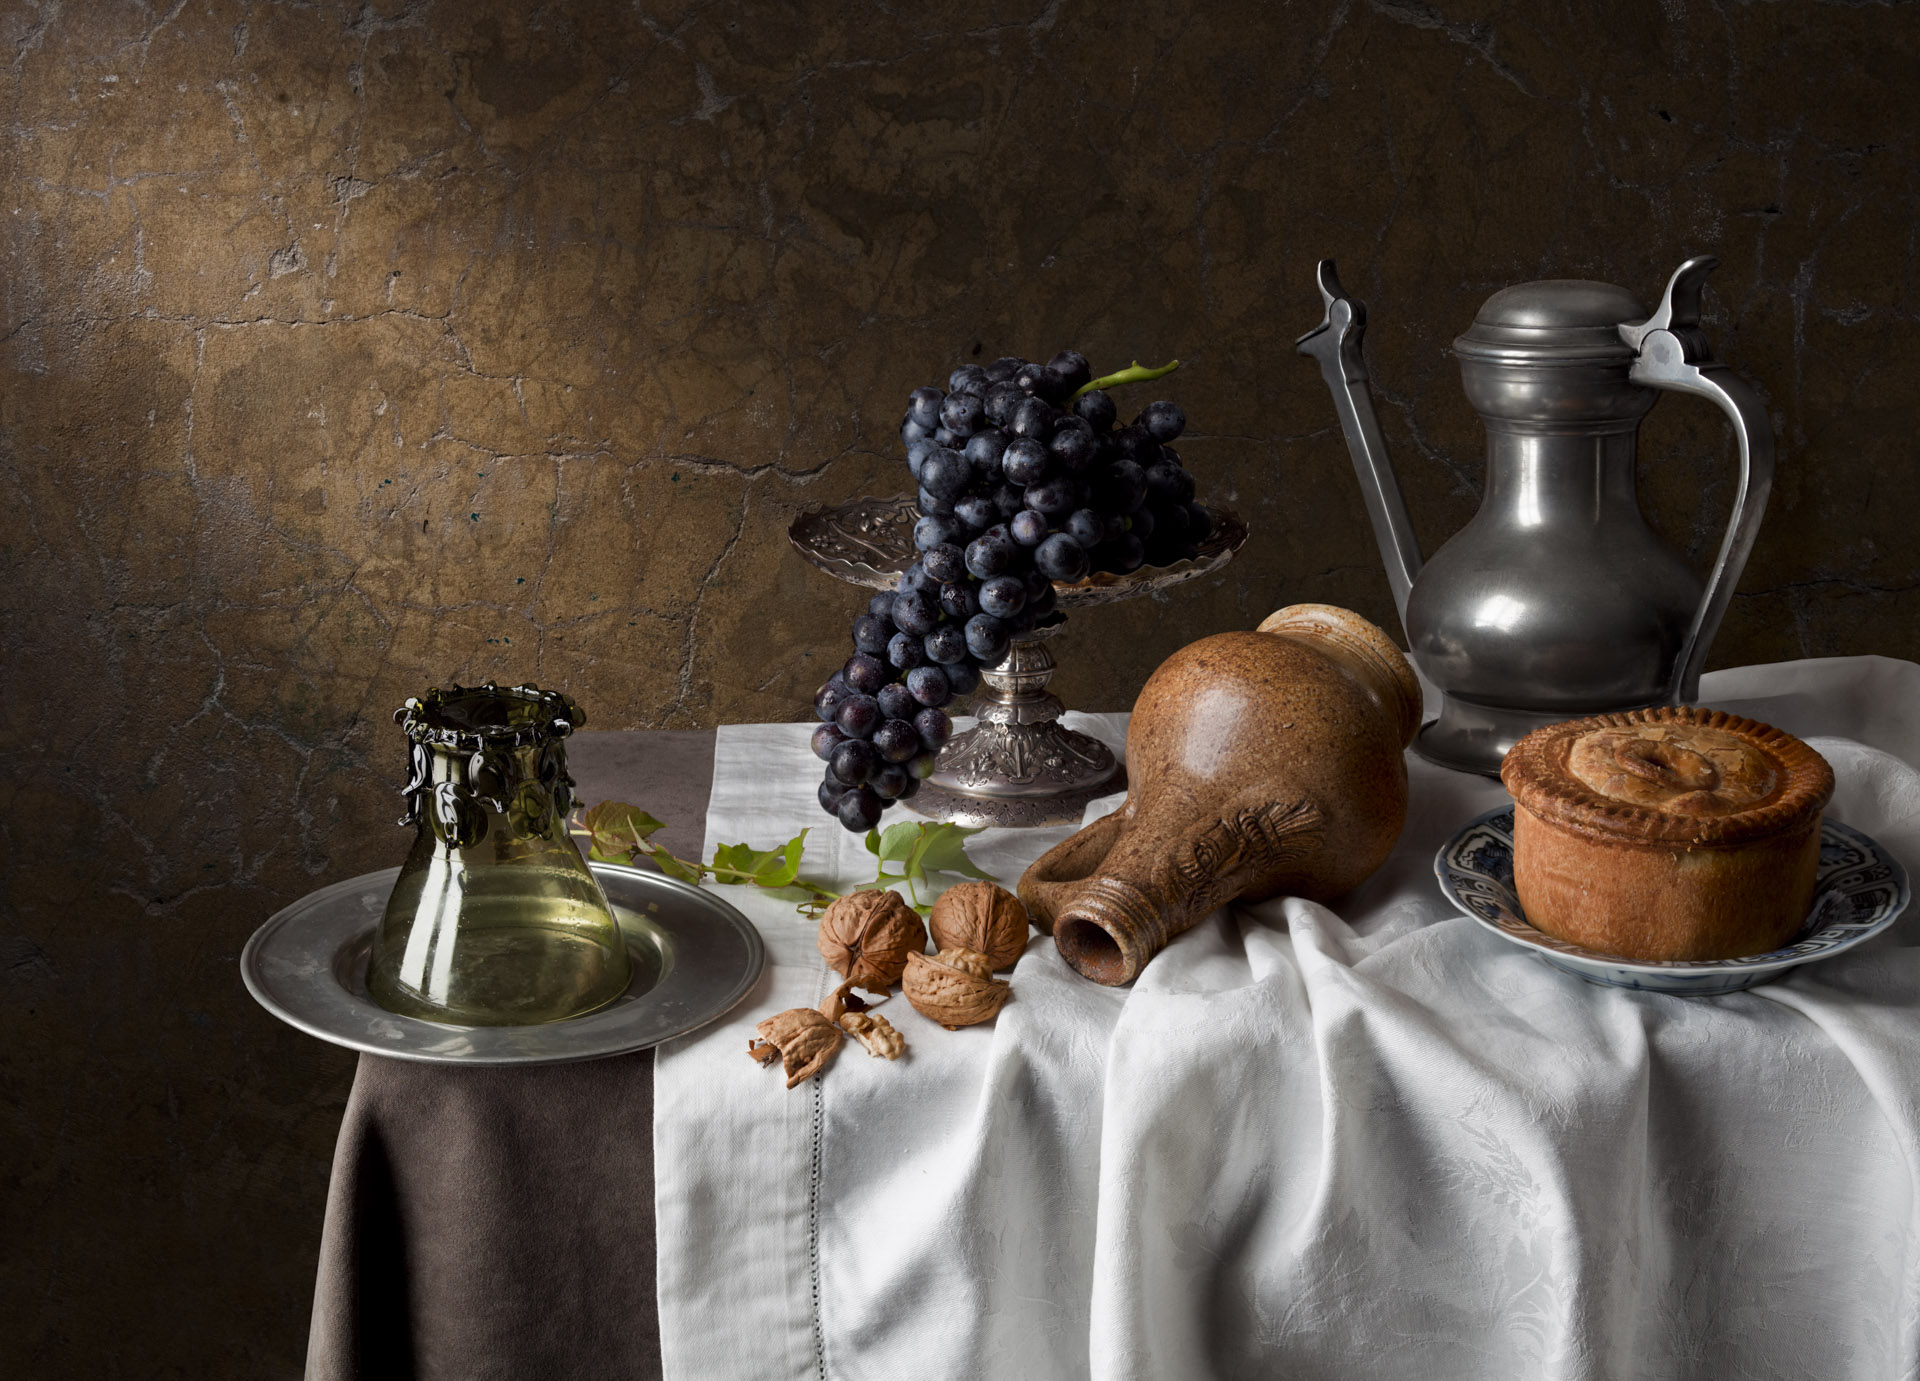 Still life with bartmann jug